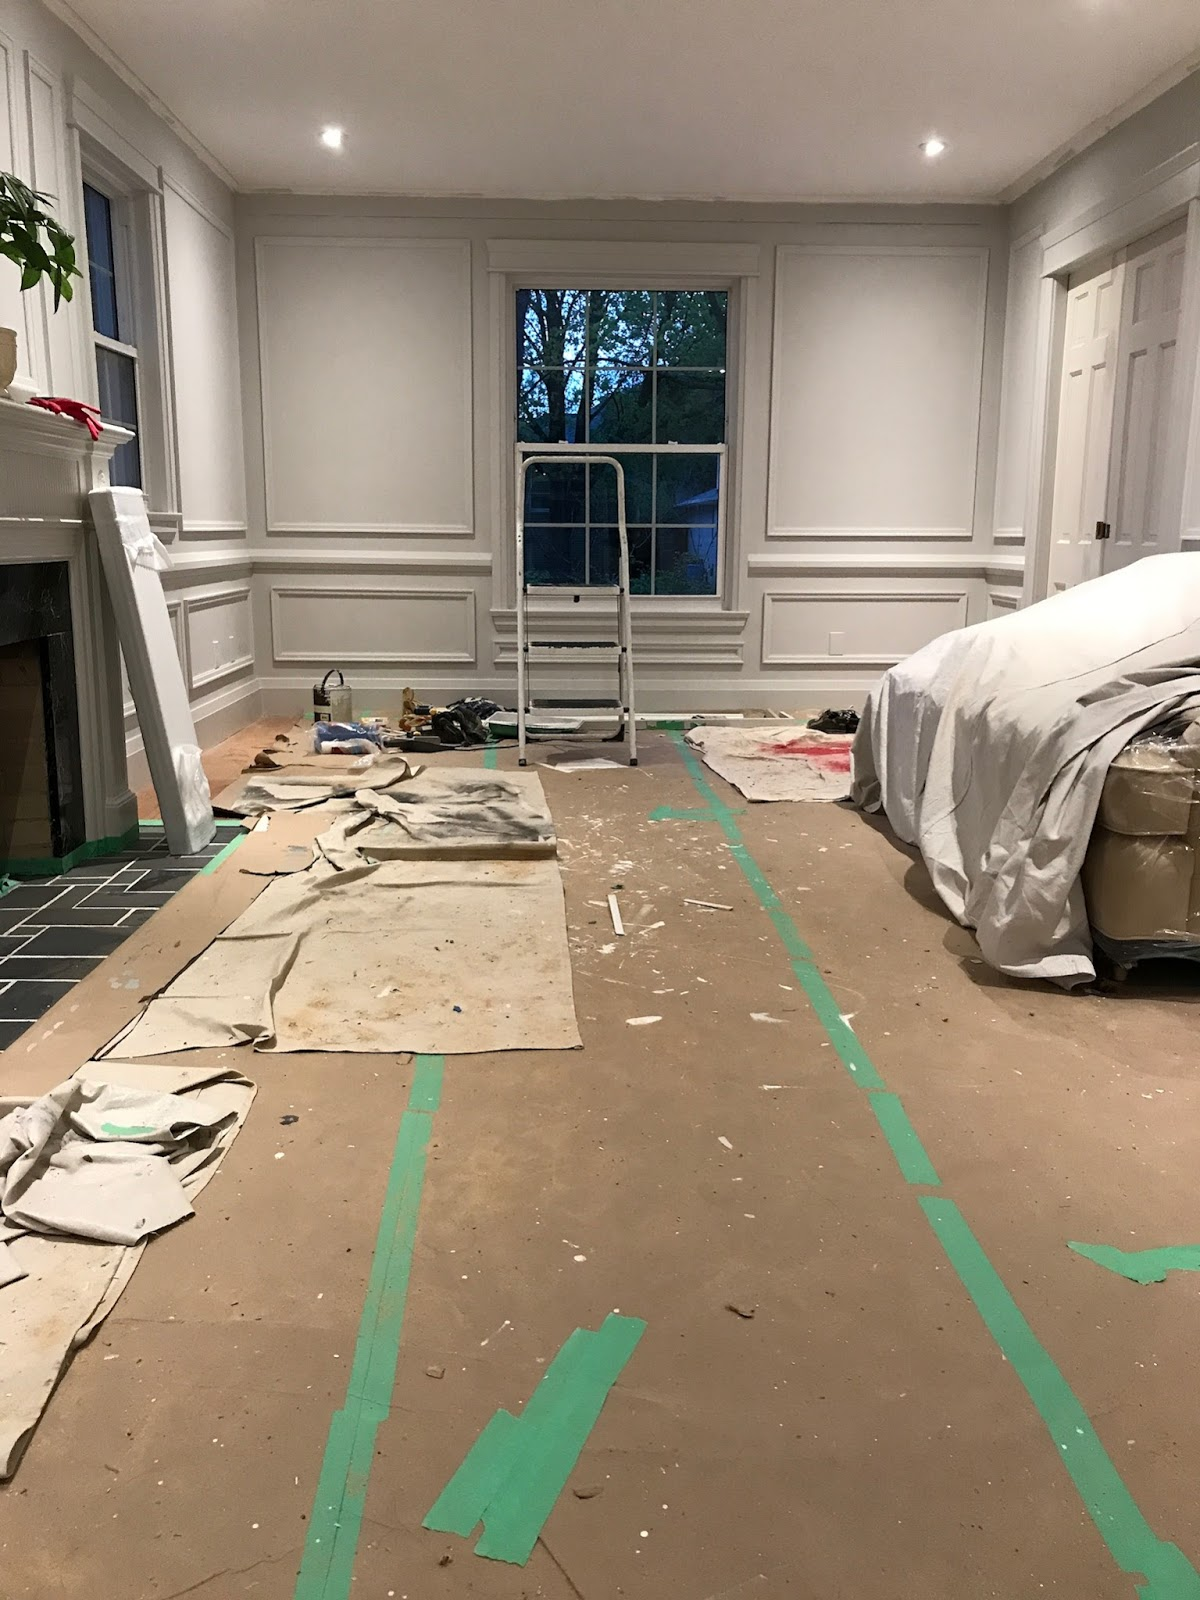 living room remodel, living room renovation, traditional living room decor, living room wall trim, one room challenge living room